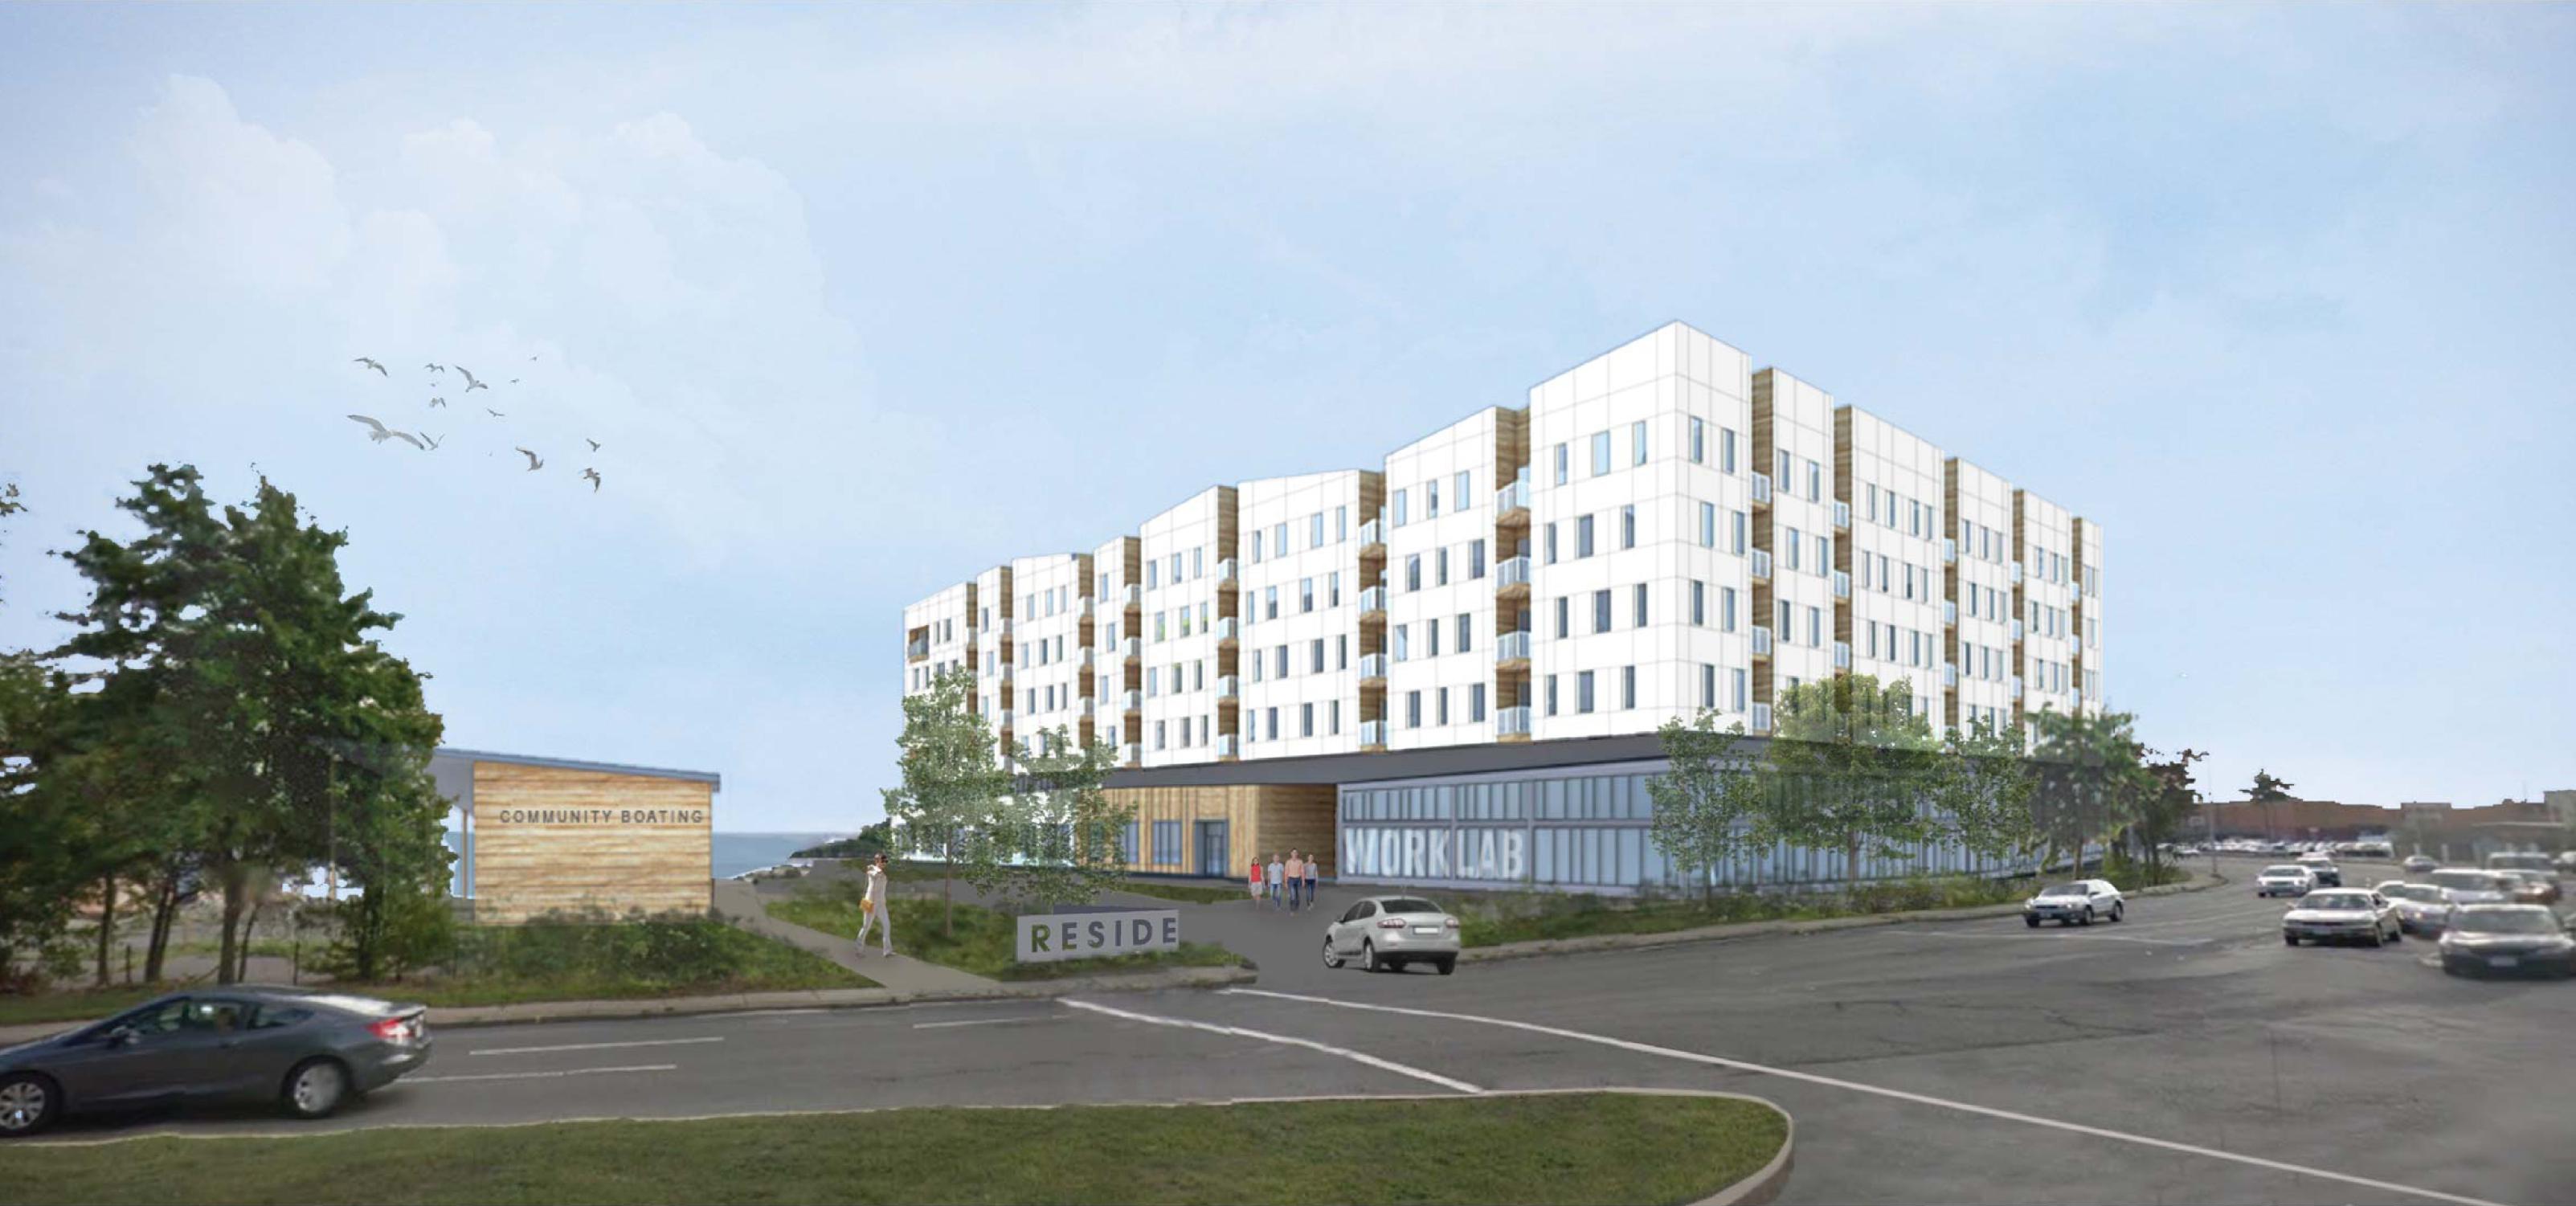 254 258 lynnway residential development lynn waterfront rendering